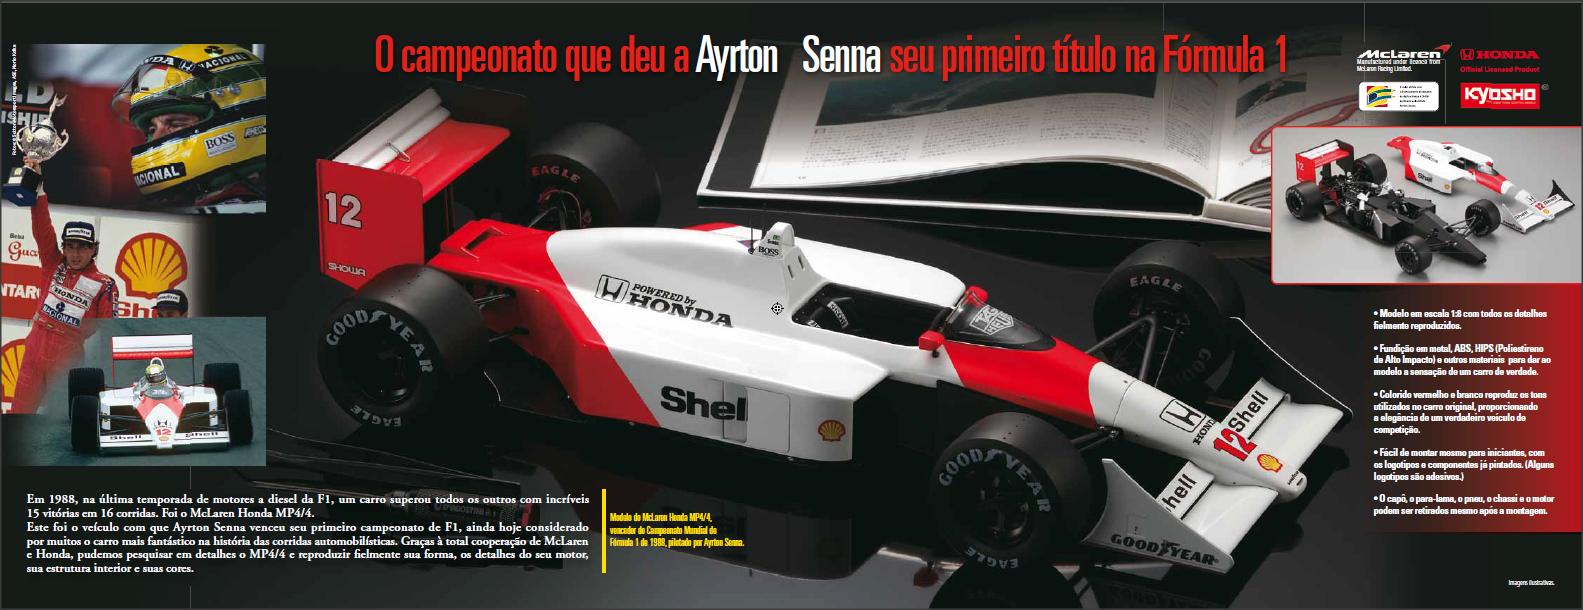 Ayrton Senna McLaren Planeta DeAgostini